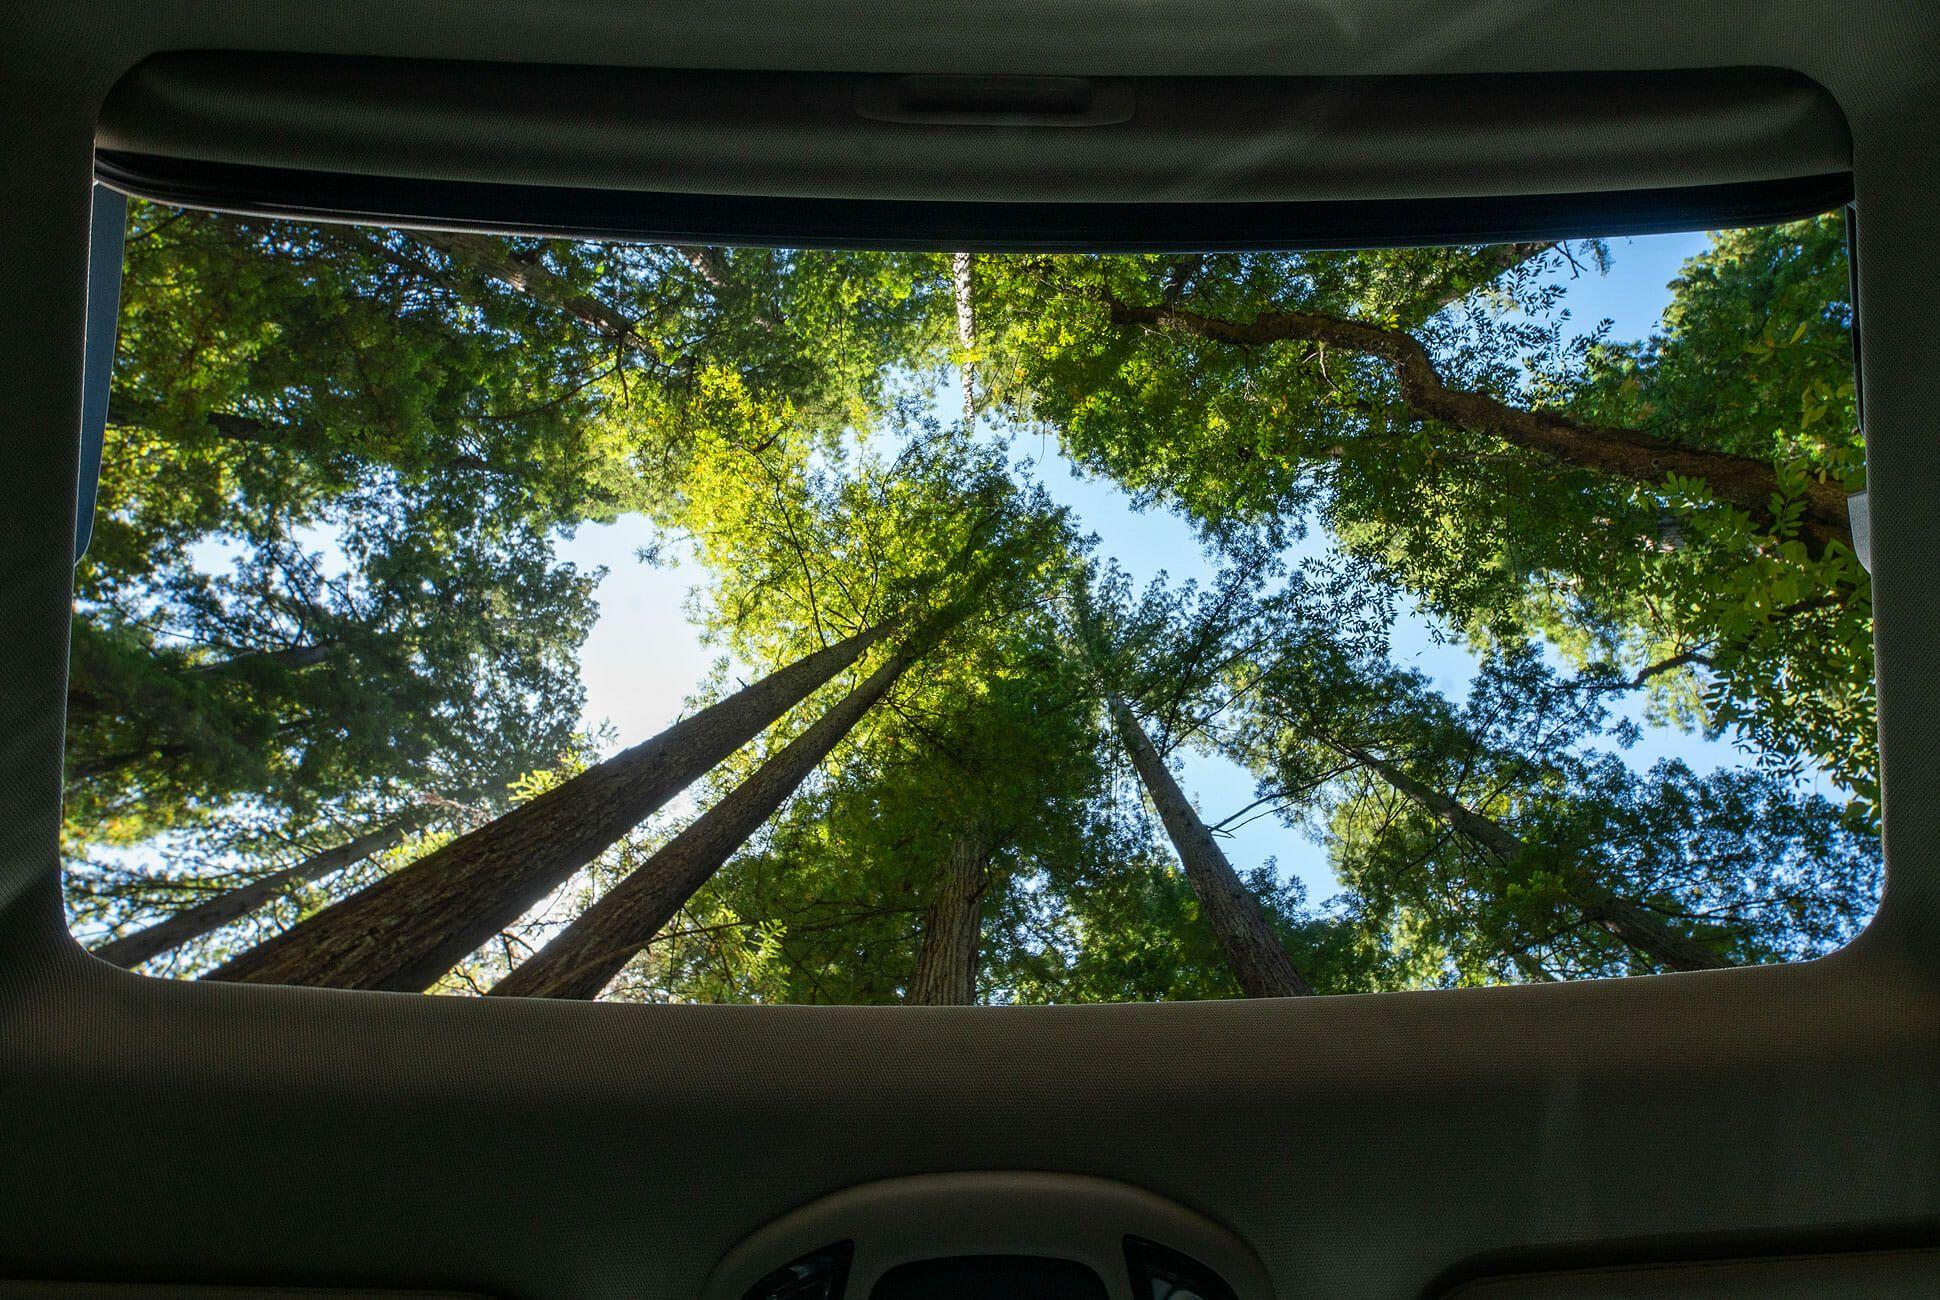 2020-Subaru-Outback-Review-gear-patrol-slide-3